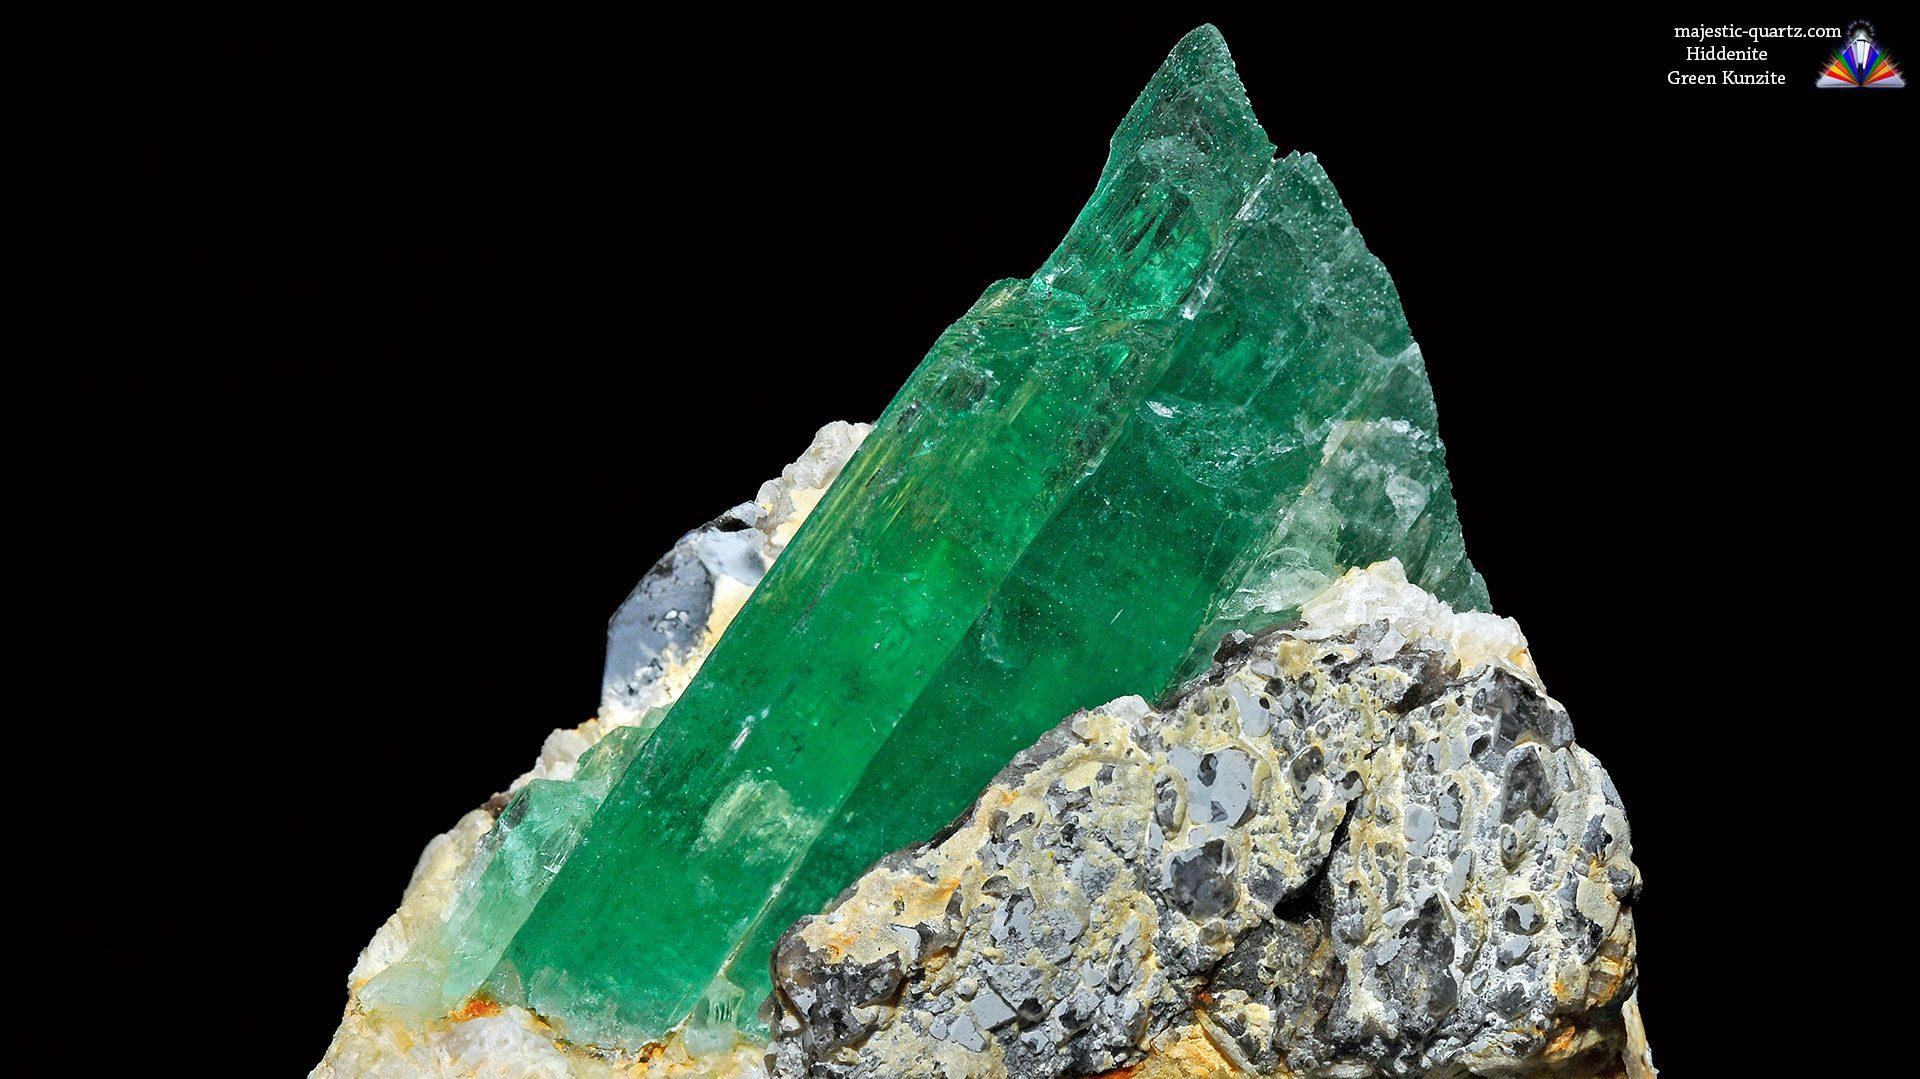 Terminated Kunzite Crystal Specimen - Mineral Specimen